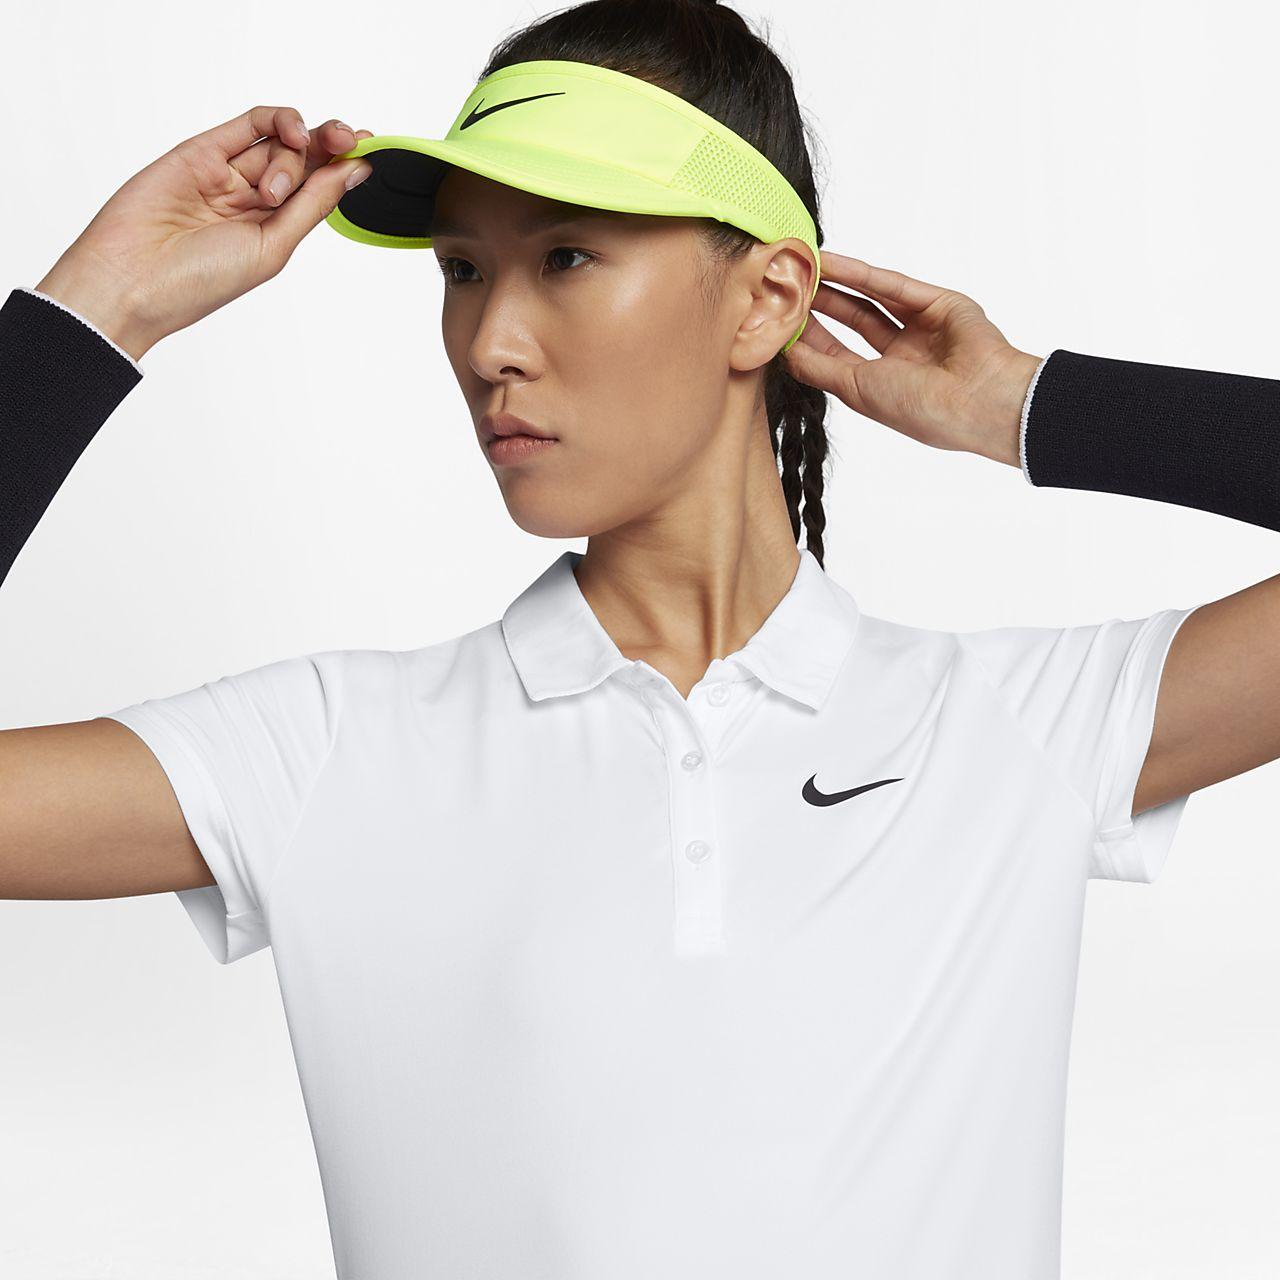 NikeCourt Pure - tennispolo til kvinder